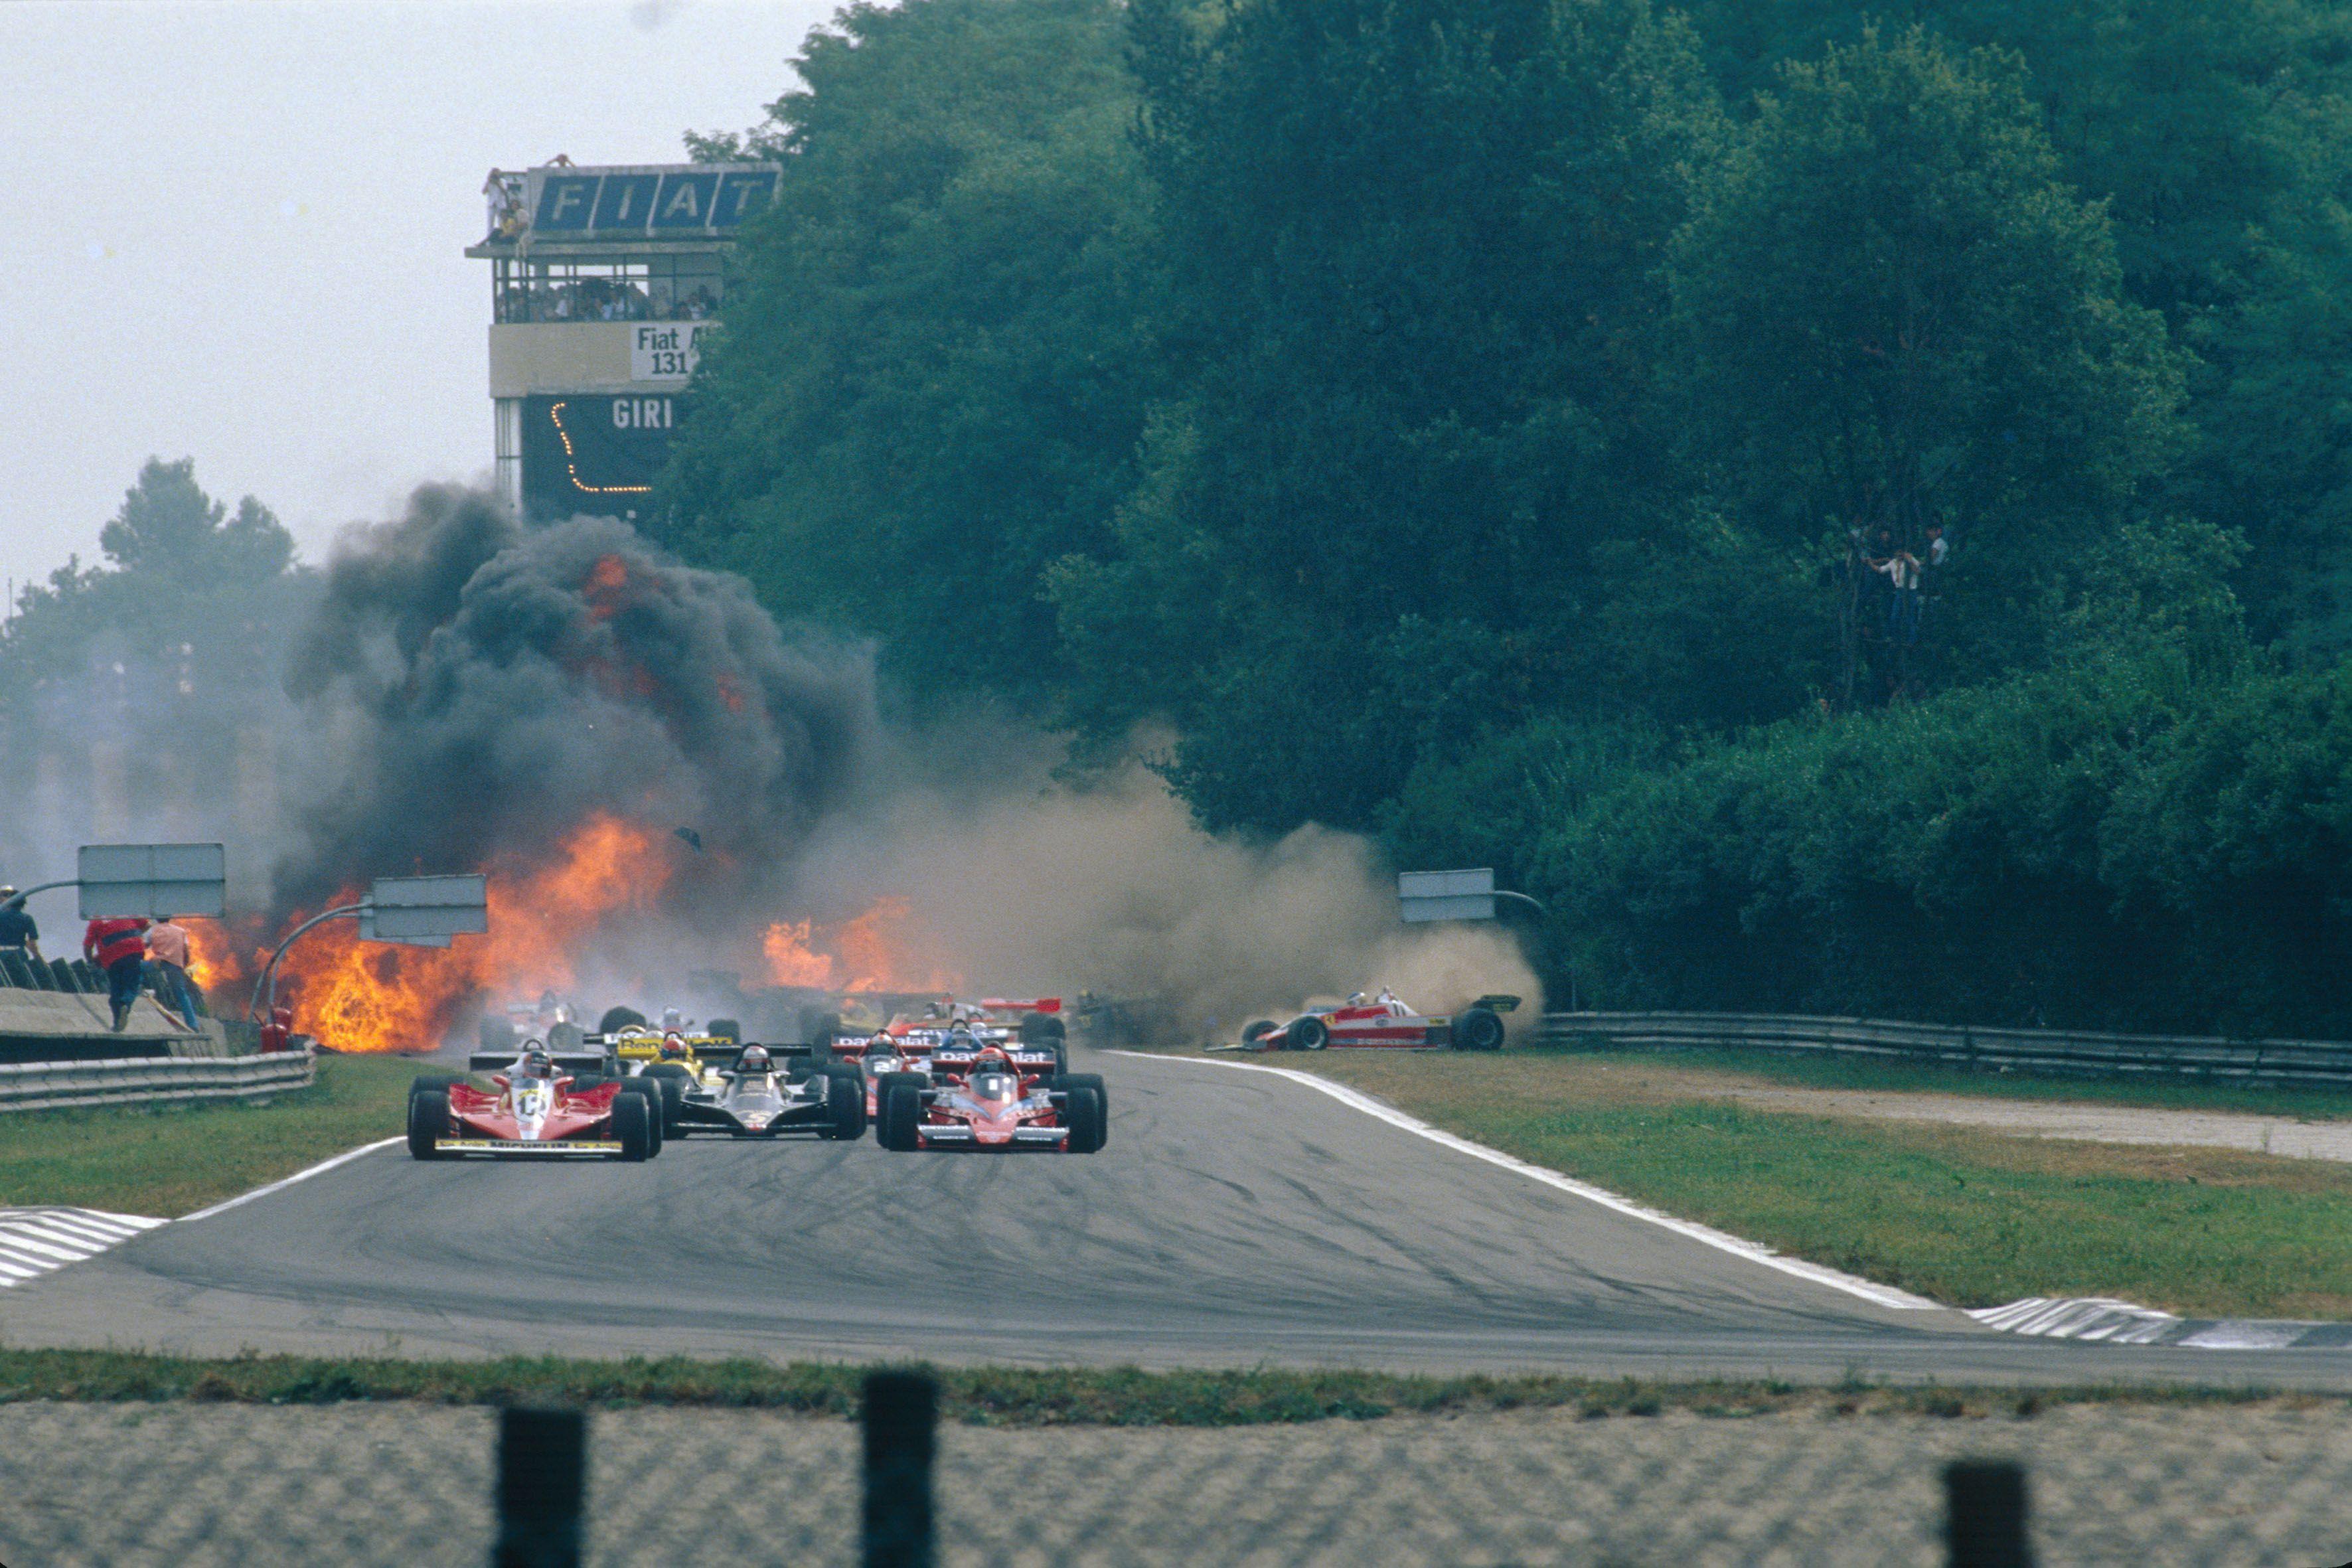 Formel 1, Grand Prix Italien 1978, Monza, 10.09.1978 Start Gilles Villeneuve, Ferrari 312T3 Niki Lauda, Brabham-Alfa Rom